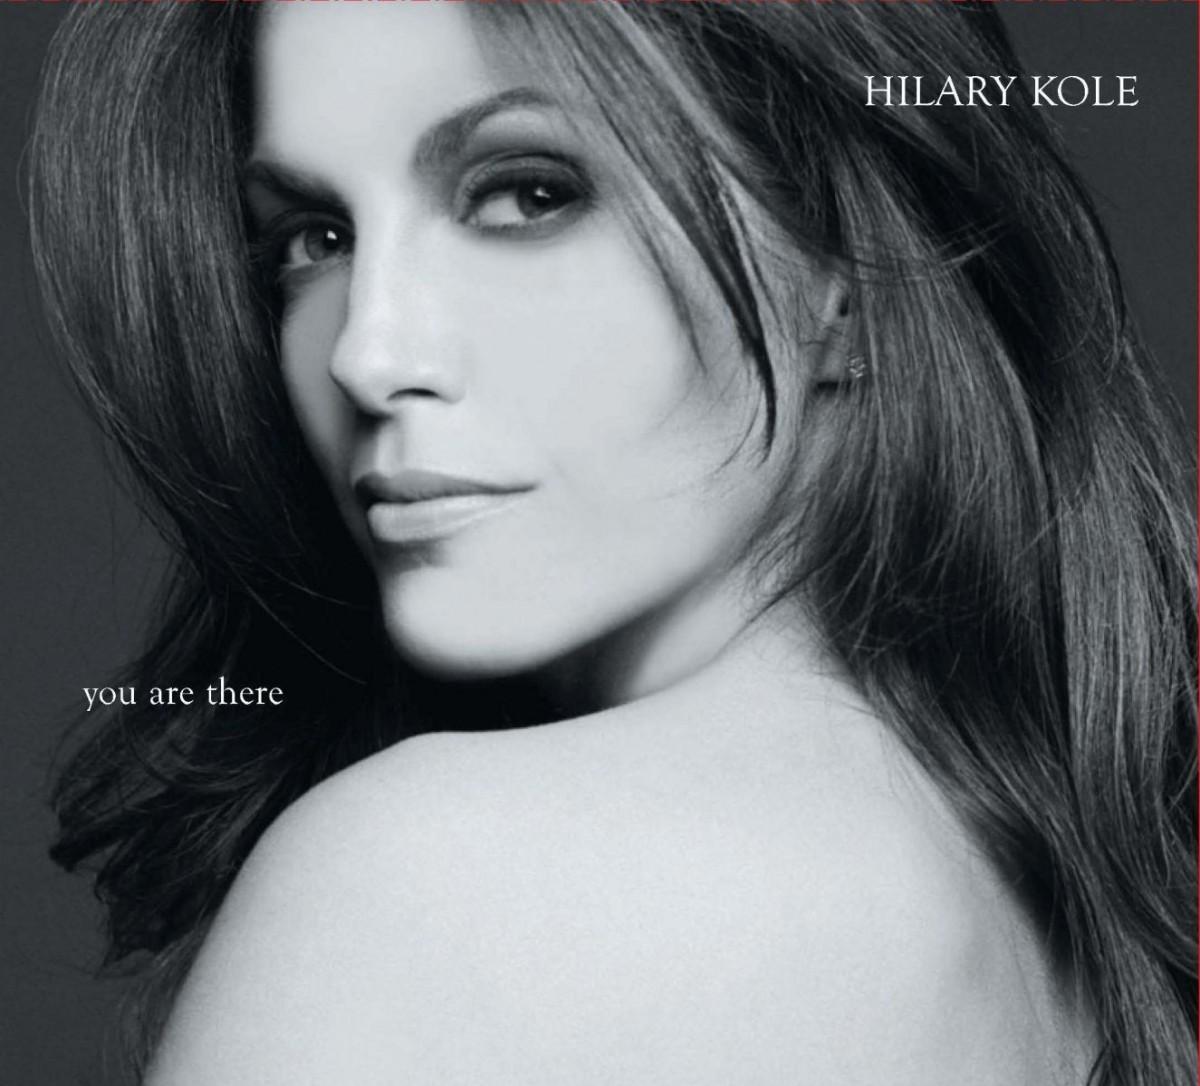 HILARY KOLE - you are there